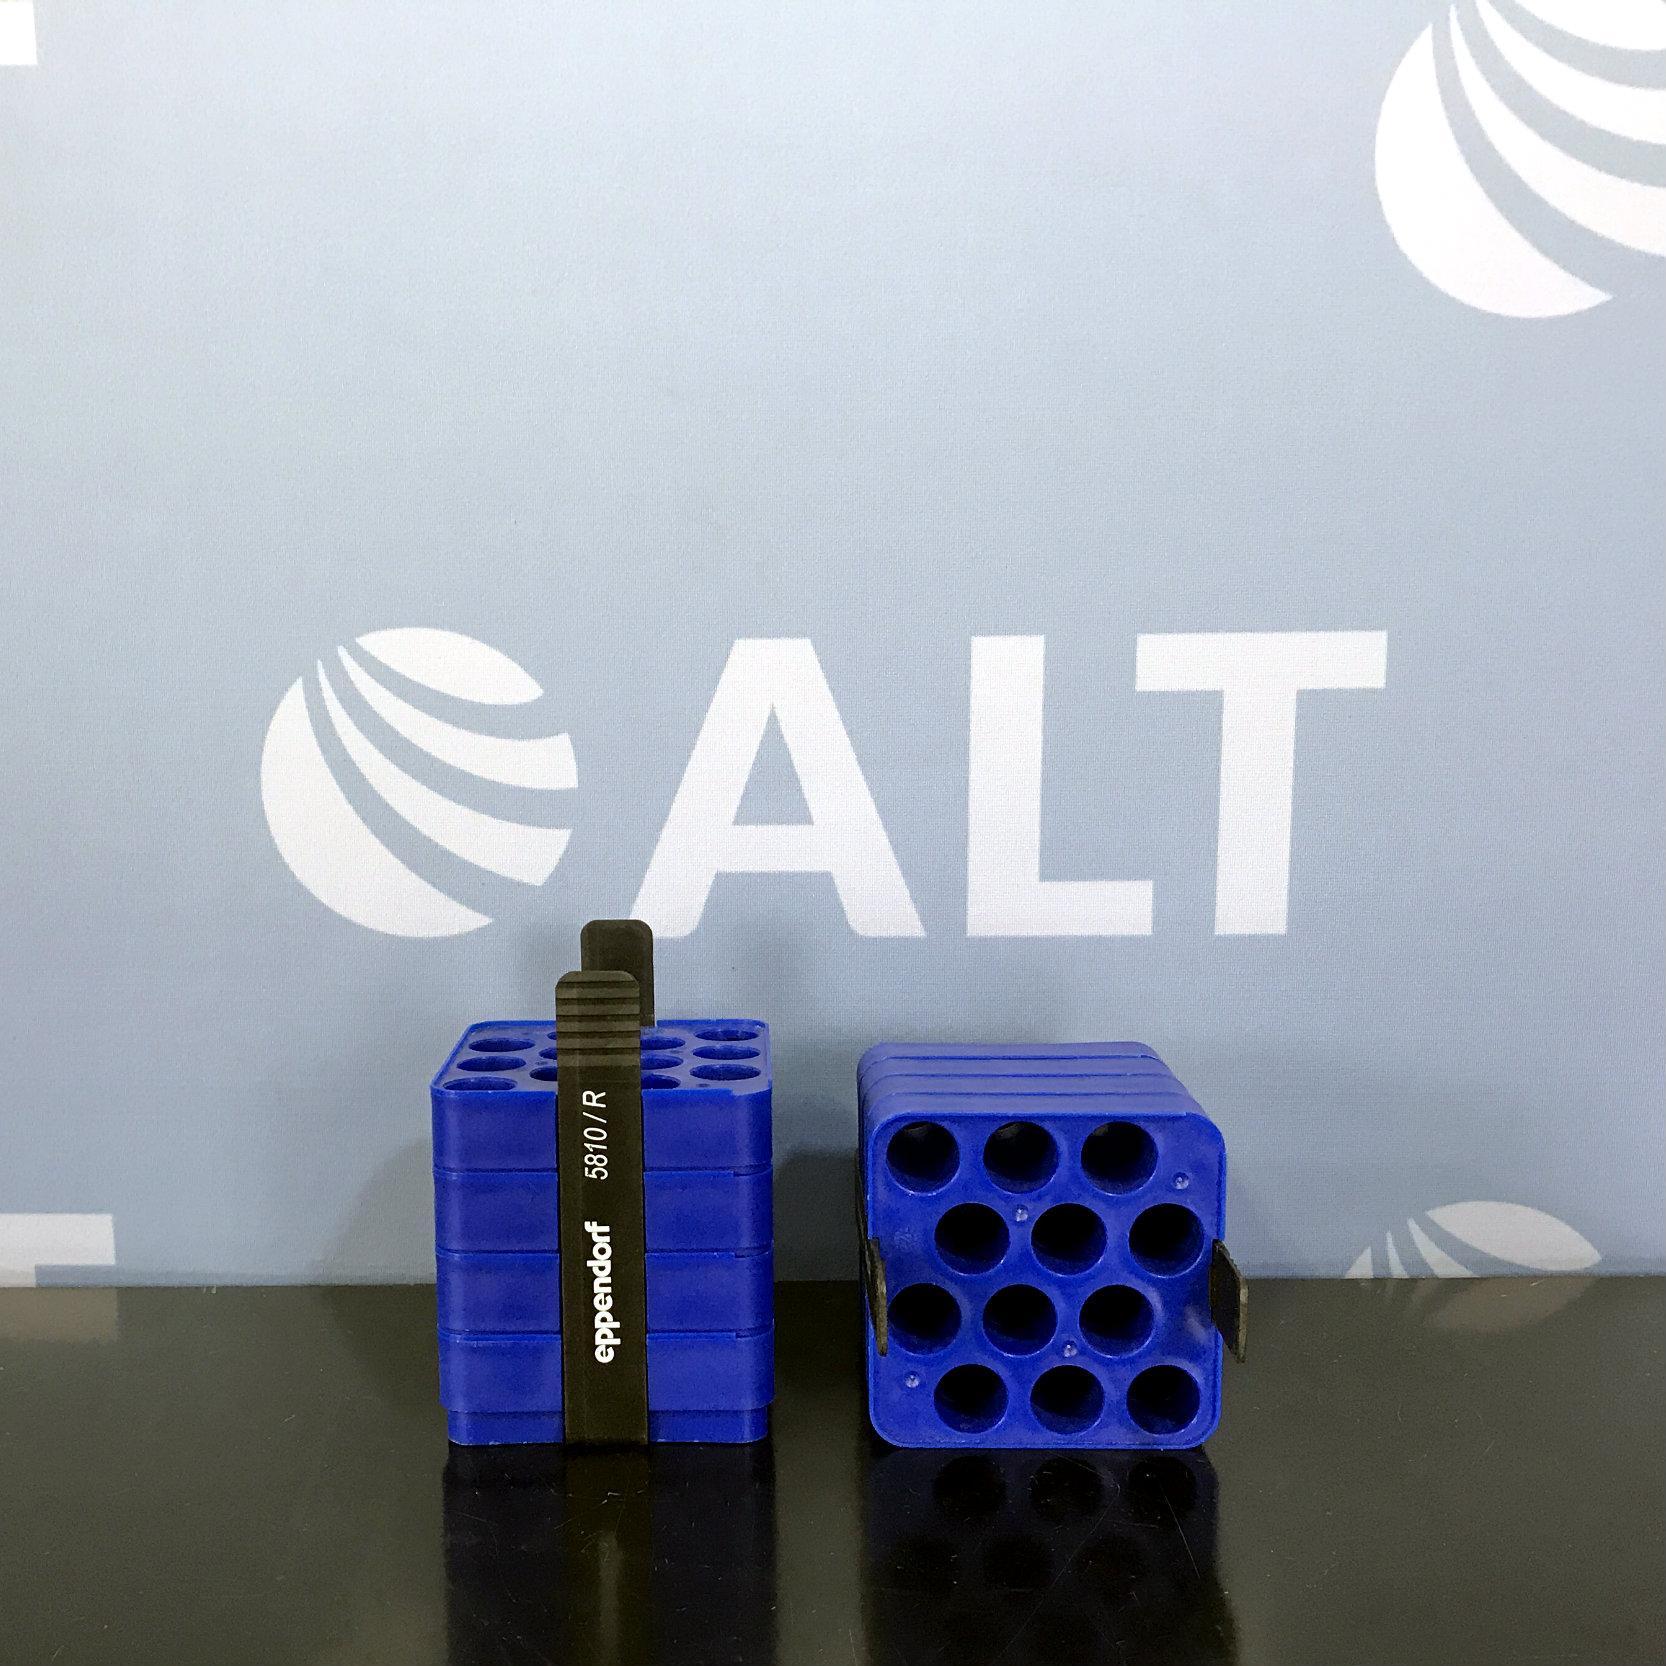 Eppendorf 5810/R (12) Tube Slot Adapter for 500 mL Rectangular Bucket. 17.5mm: Conical Bottom (Set of 2) Image